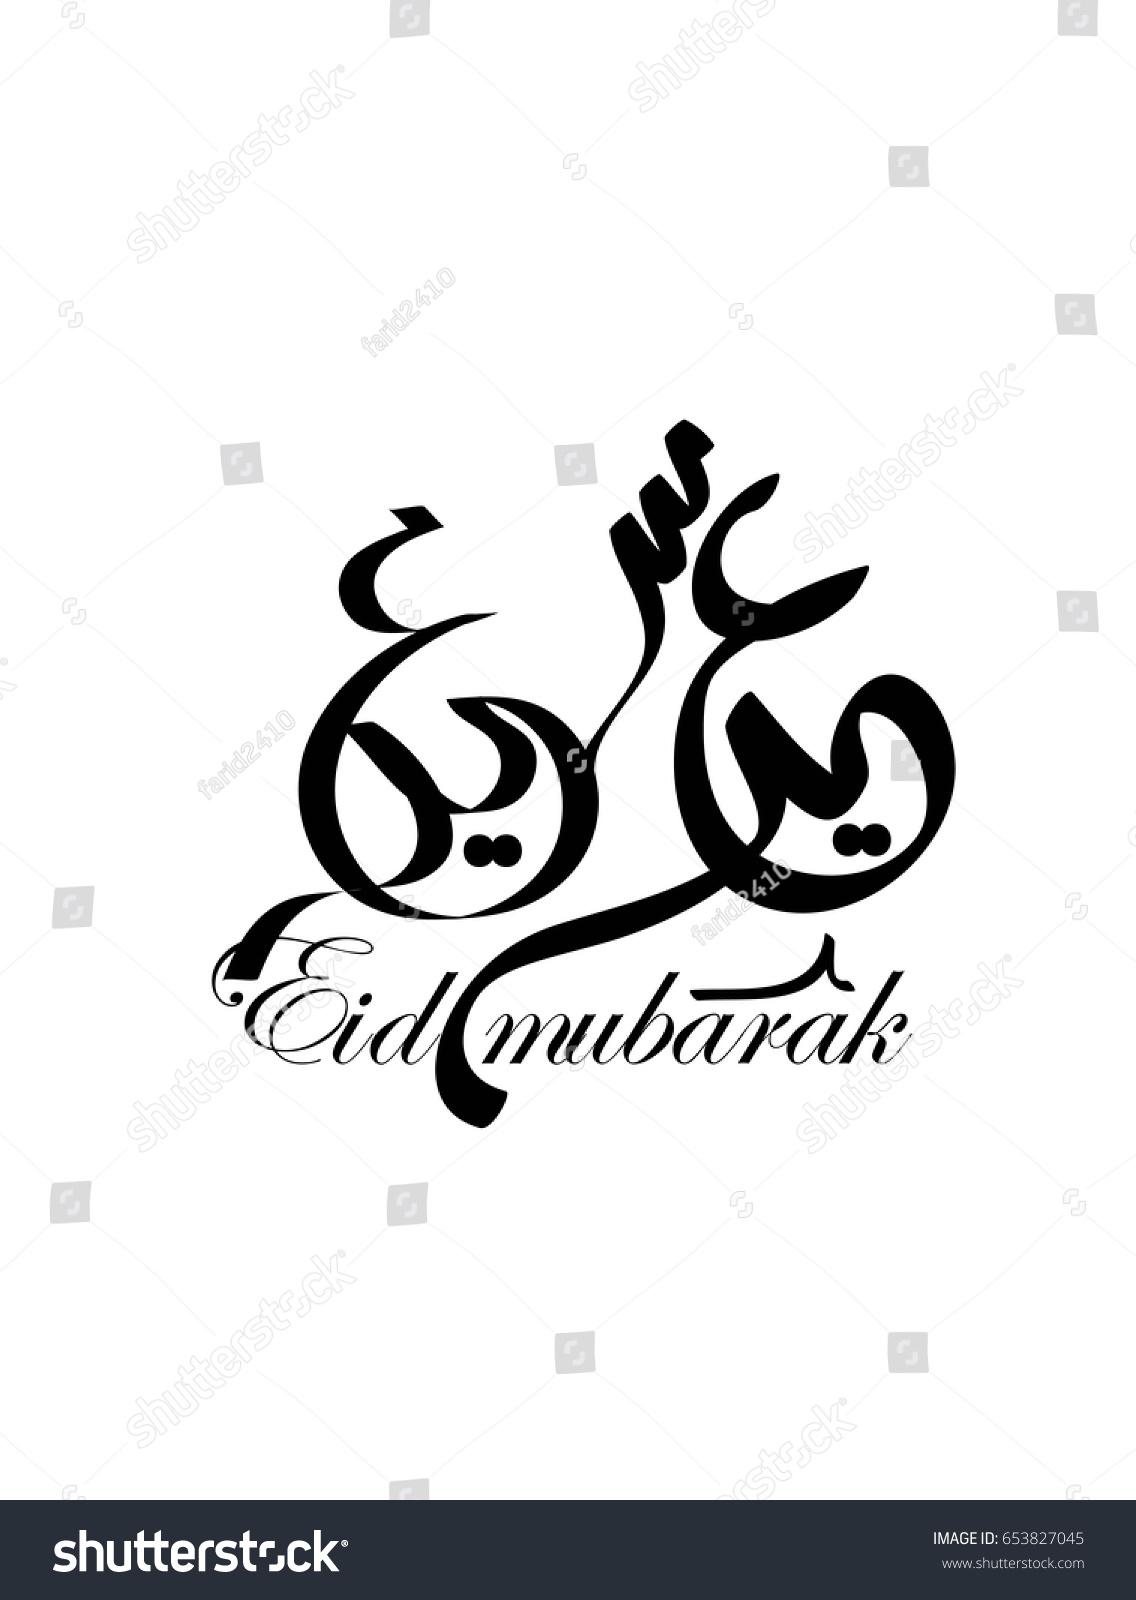 Best Rajab Eid Al-Fitr Greeting - stock-vector-eid-mubarak-greeting-card-al-fitr-al-adha-the-arabic-calligraphy-means-eid-mubarak-653827045  Gallery_83233 .jpg